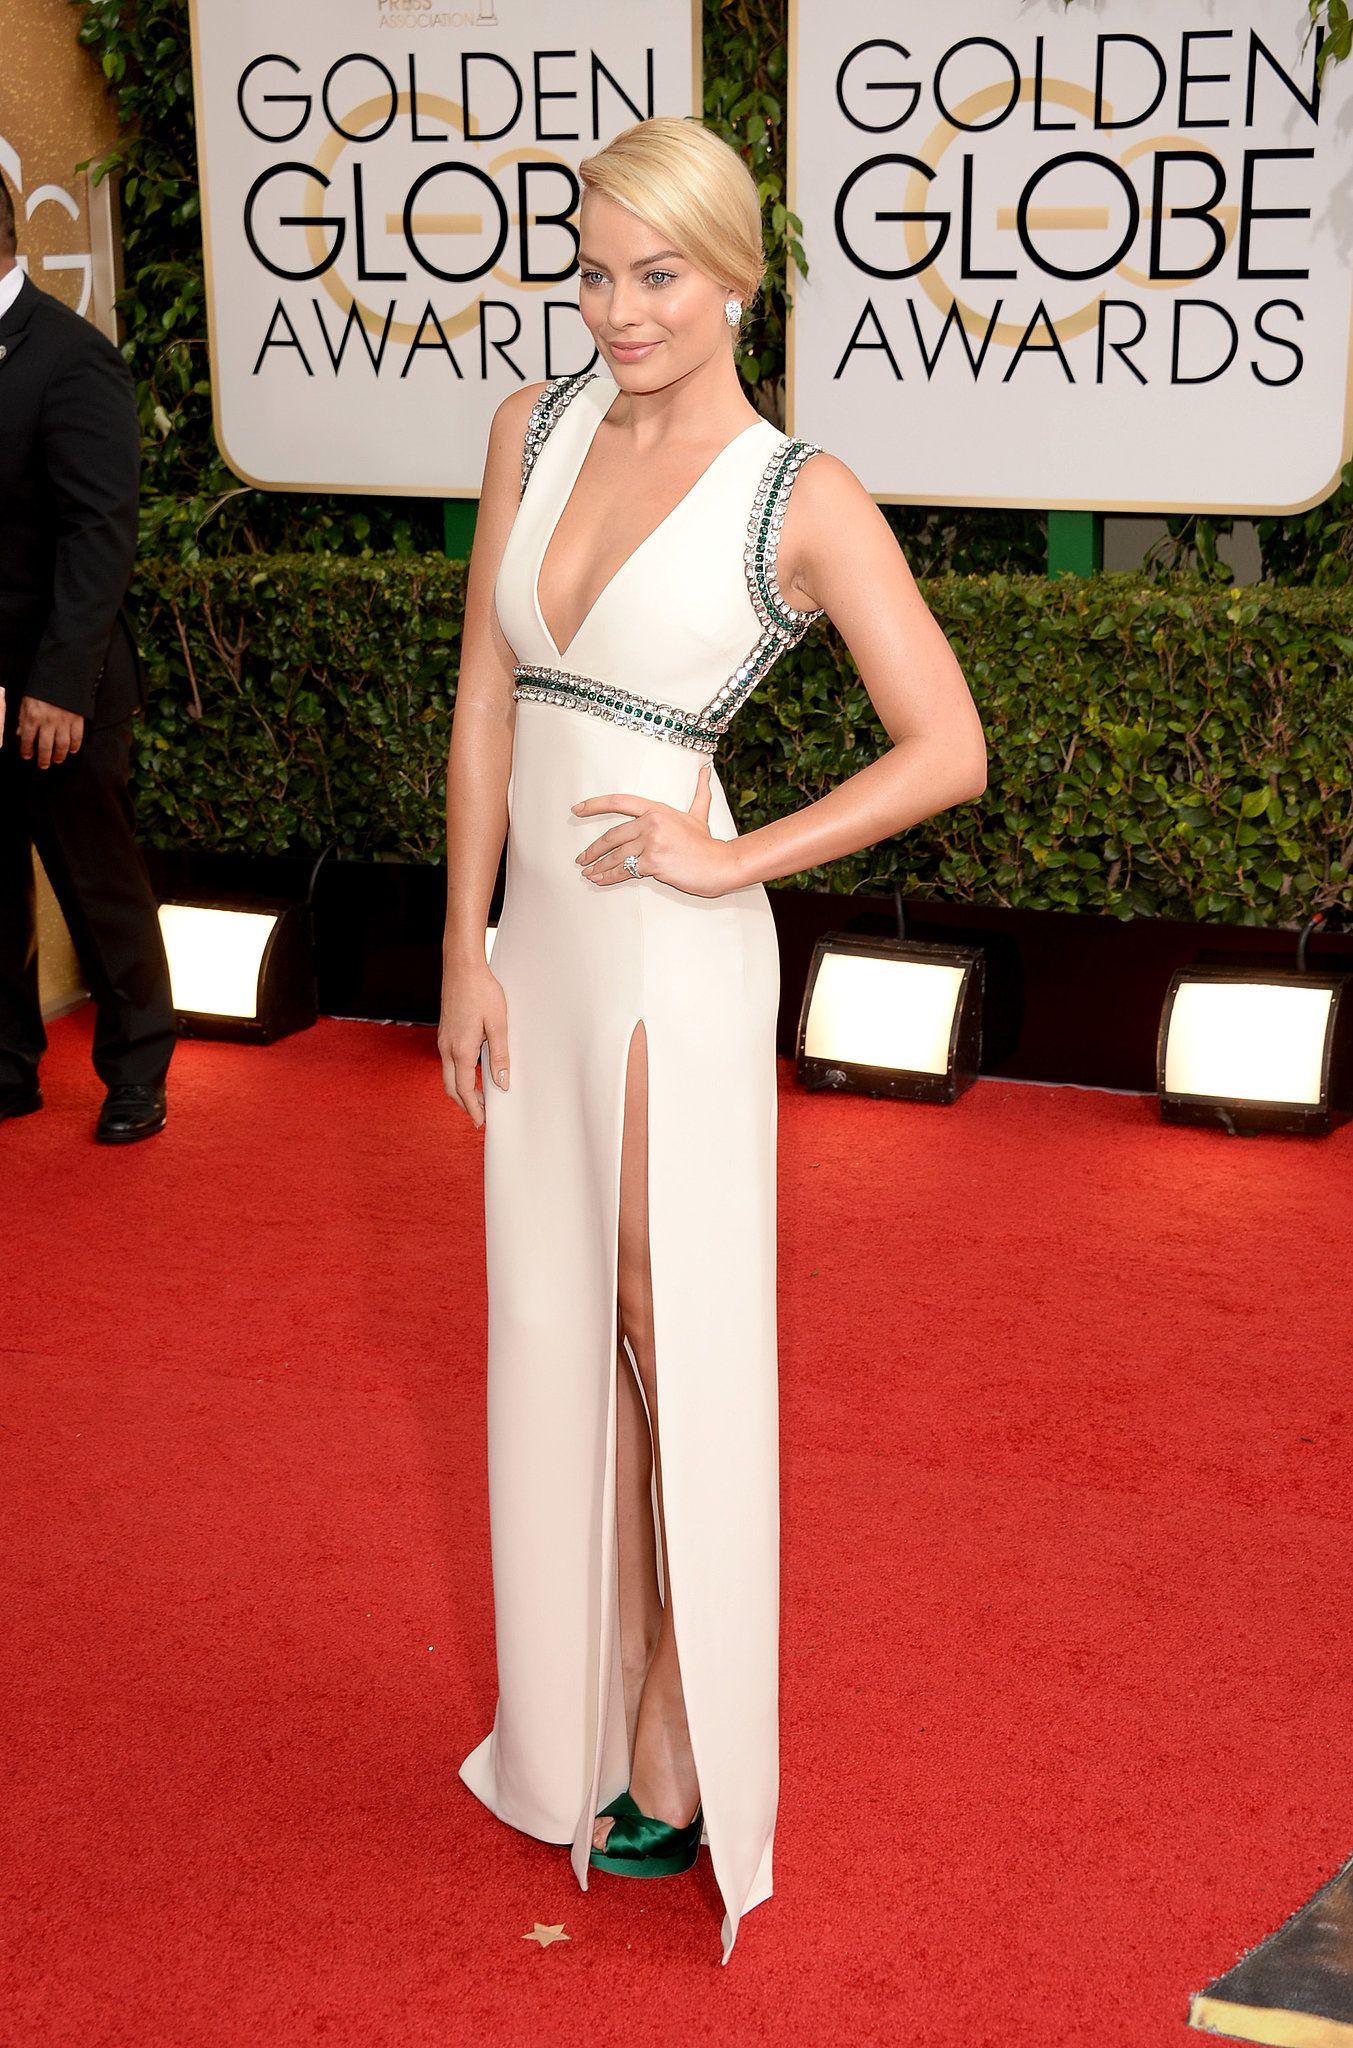 Anna faris wedding dress  Margot Robbie Cracks Jokes at Her First Golden Globes  Margot